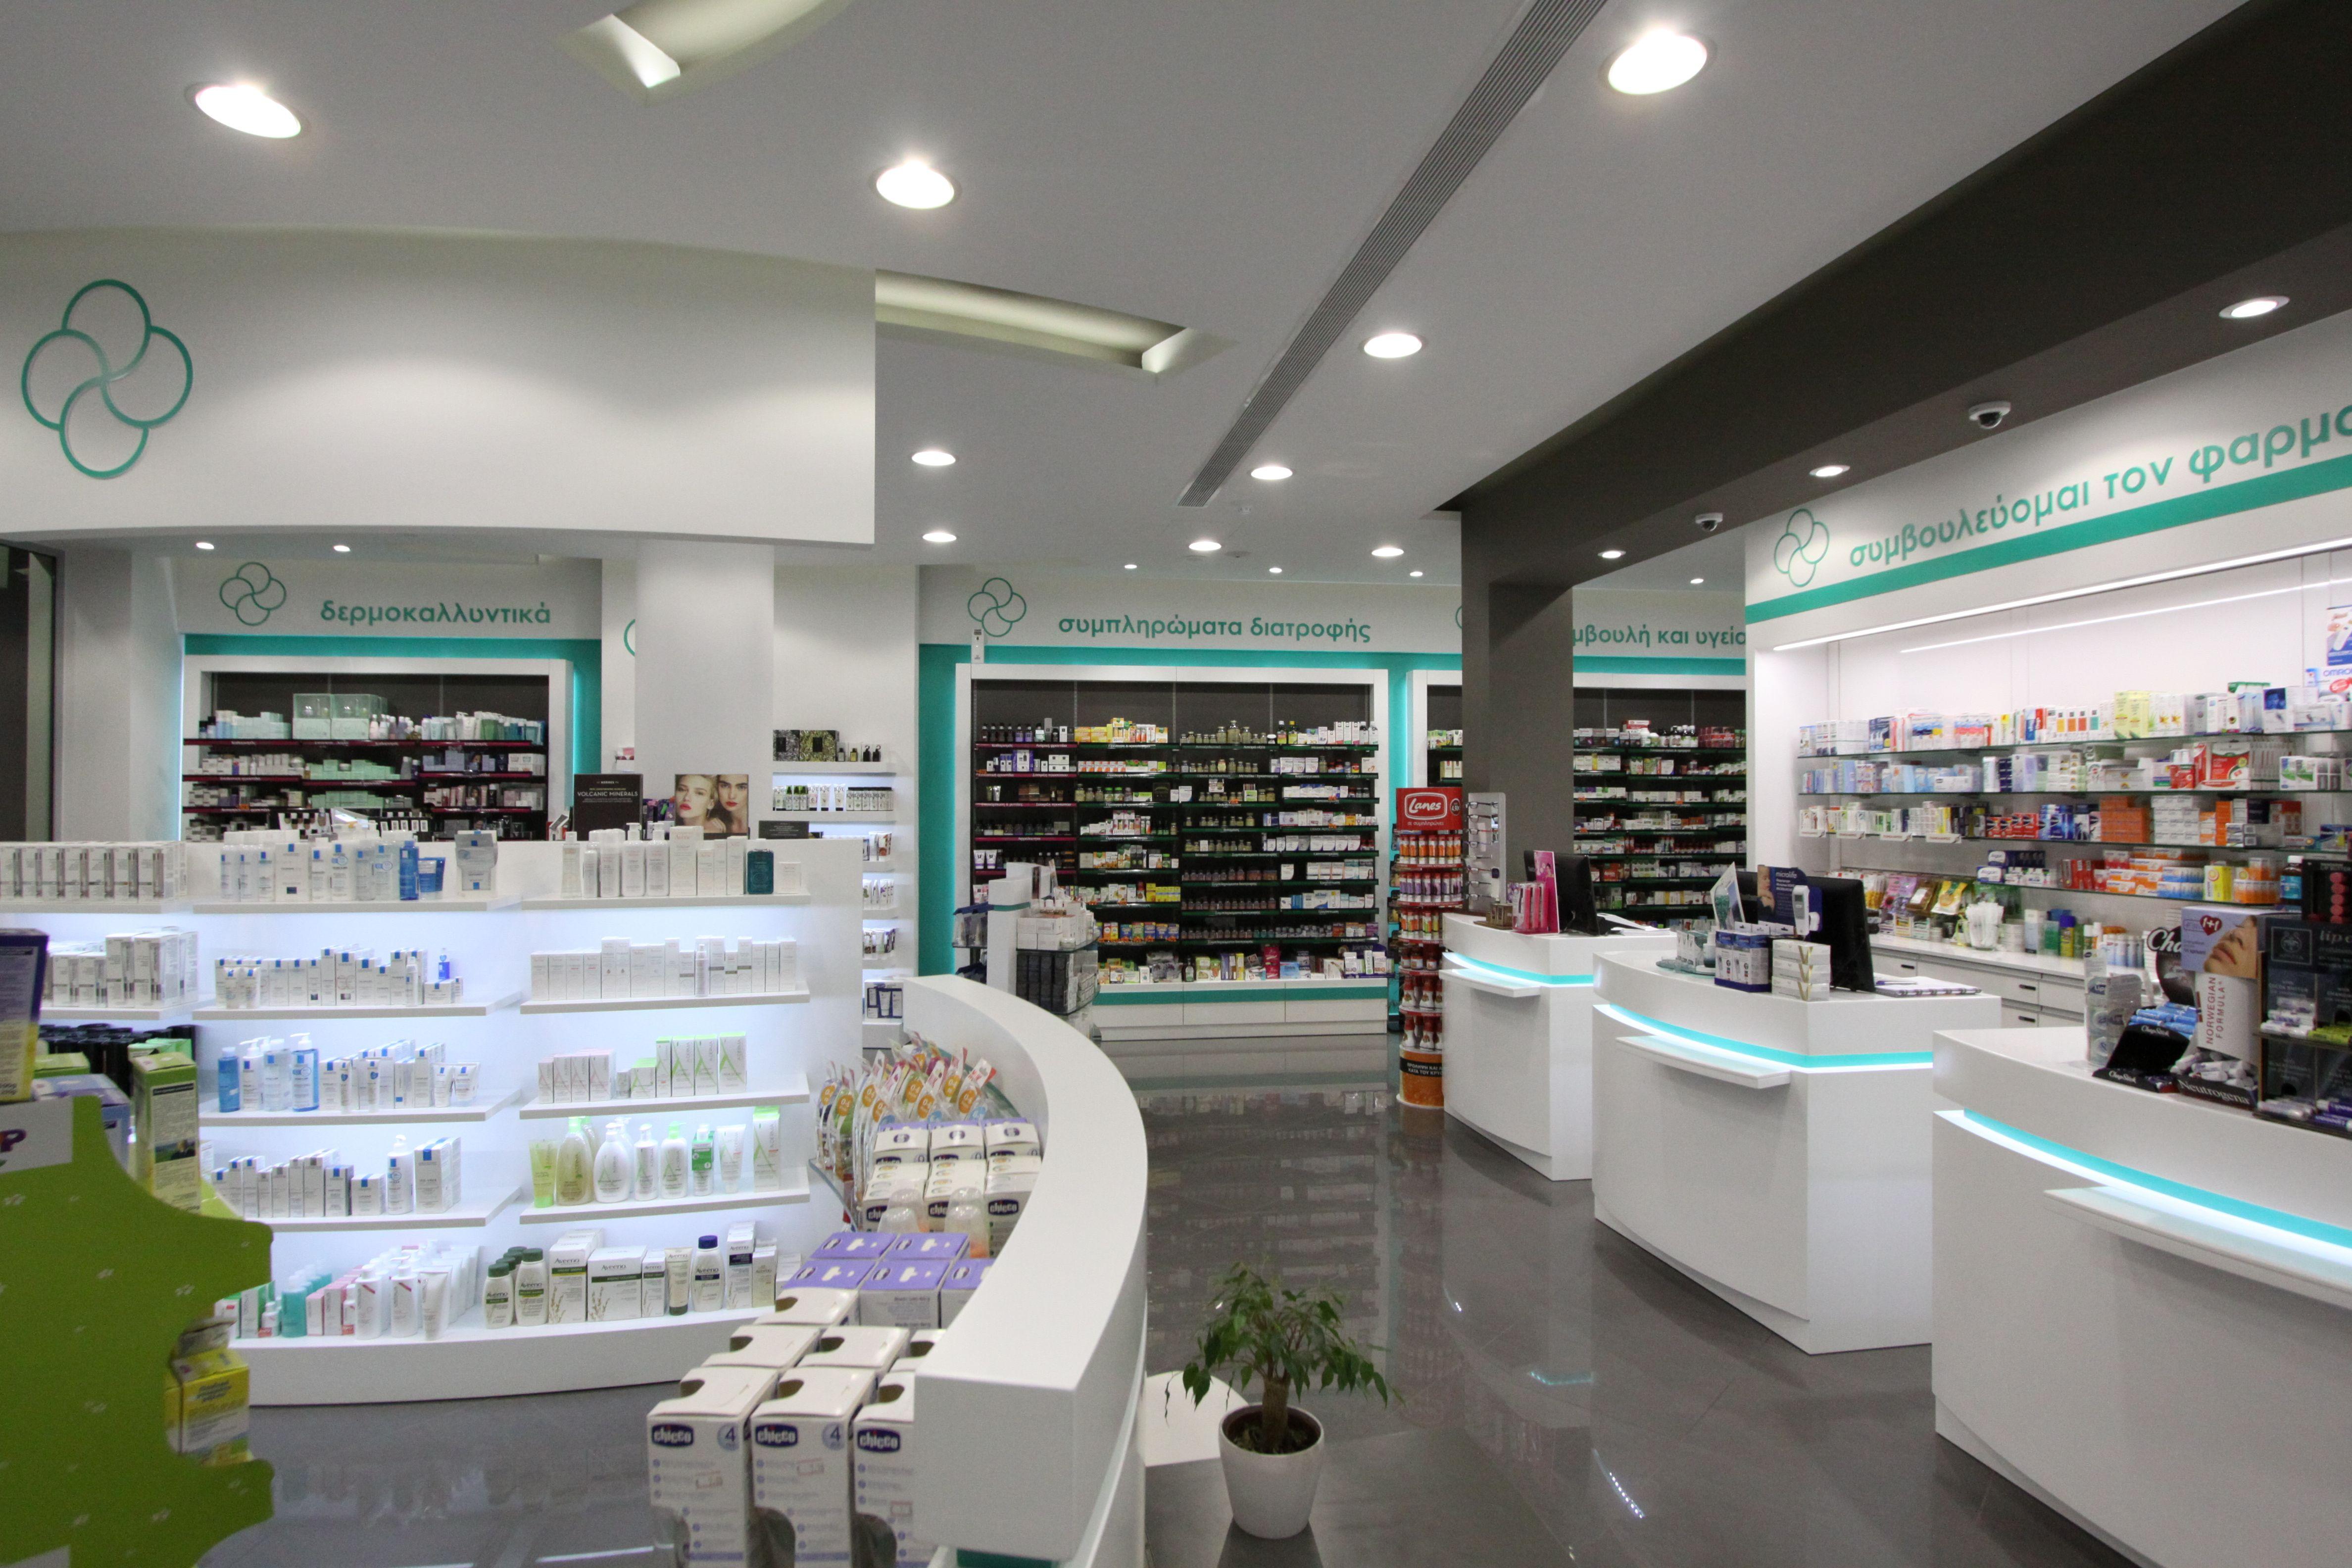 Dimitrellos Pharmacy | smexcii | Pinterest | Pharmacy, Pharmacy ...